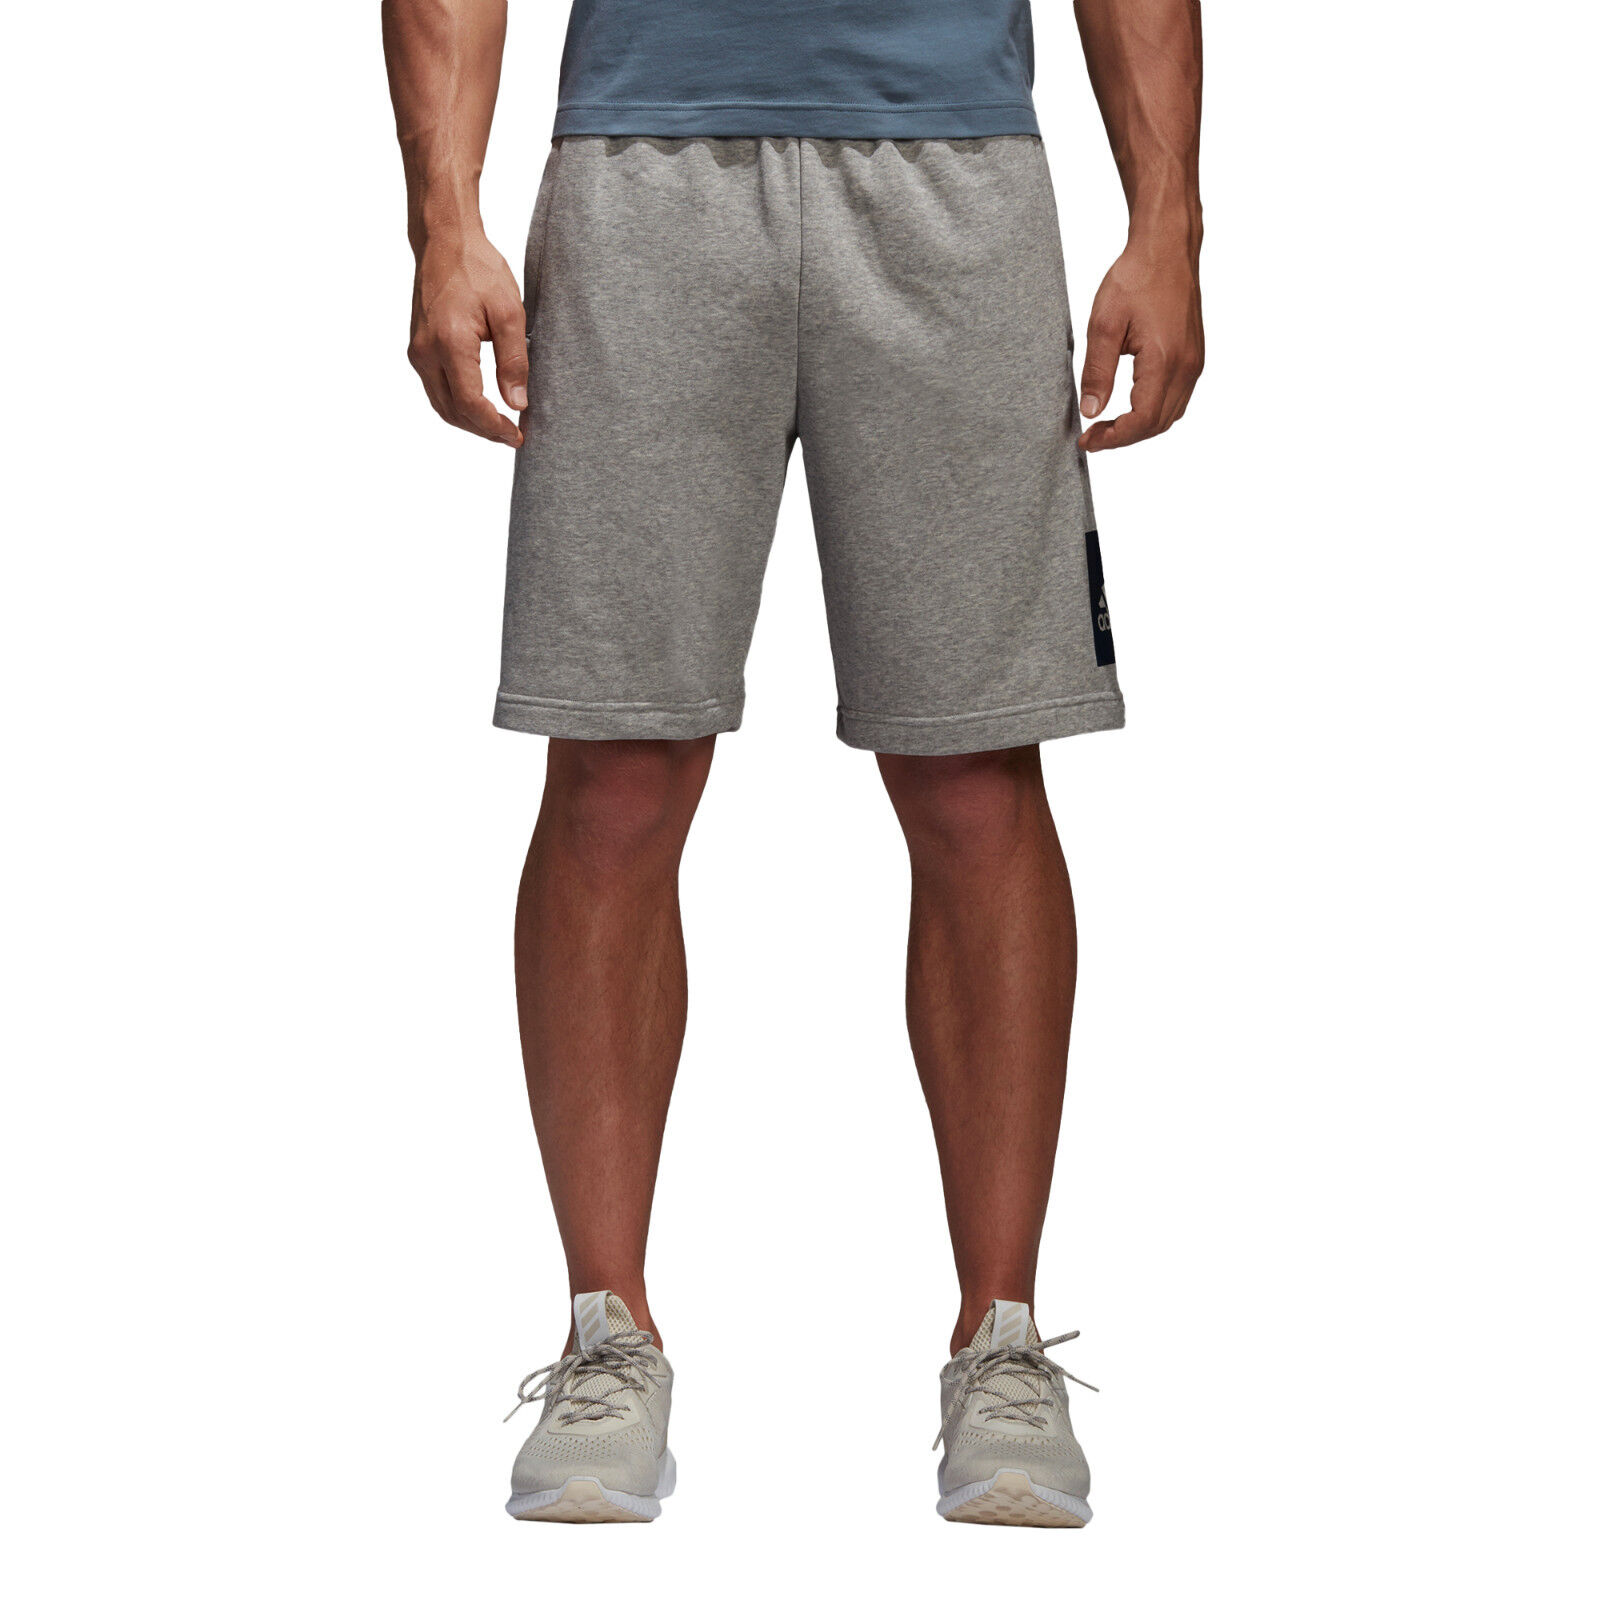 Adidas Pantooncini Allen Allen Atletica Essentials Logo Scatola Corsa